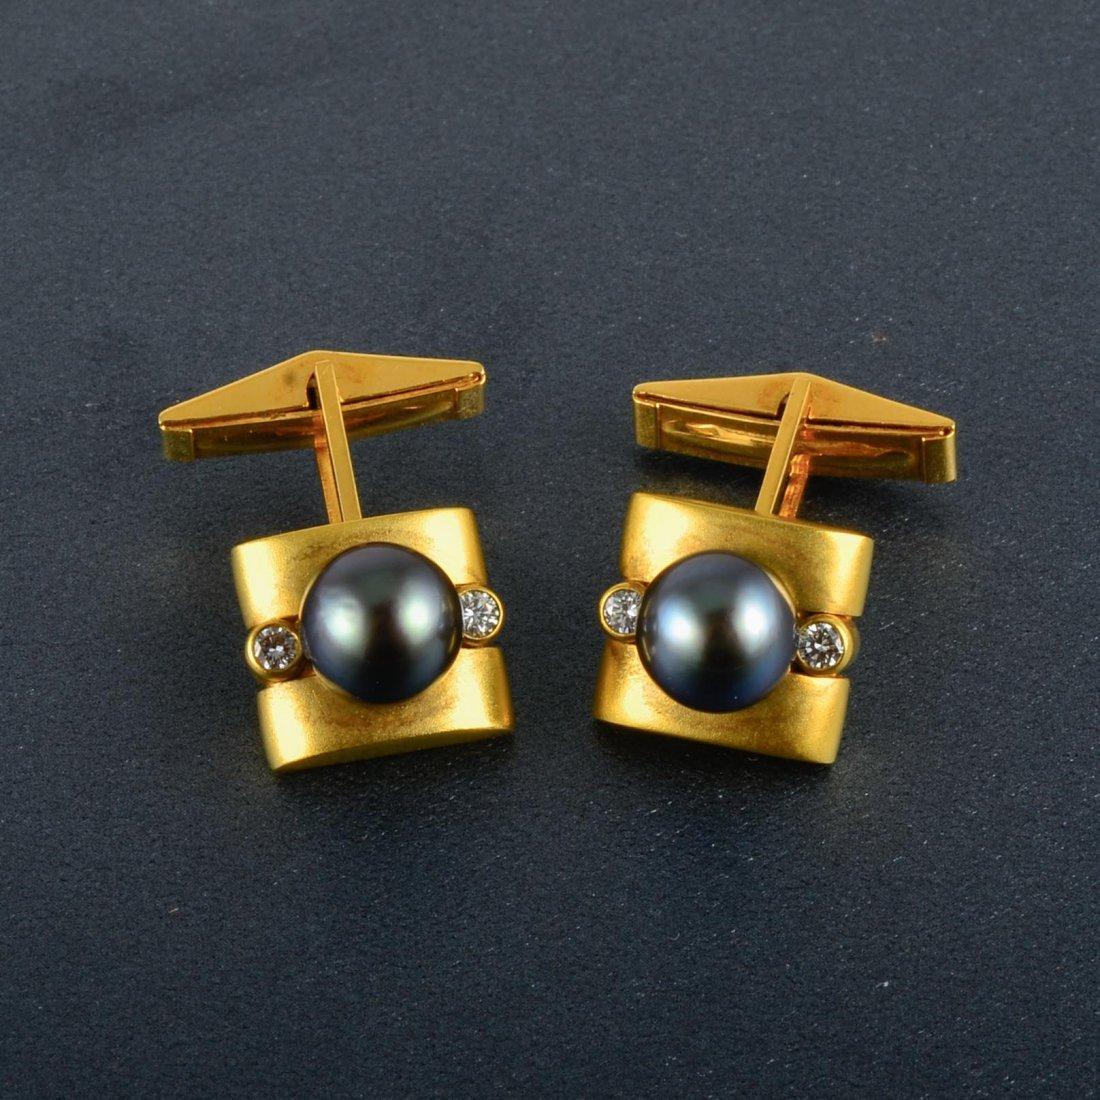 18K YG Diamond and Pearl Cufflinks